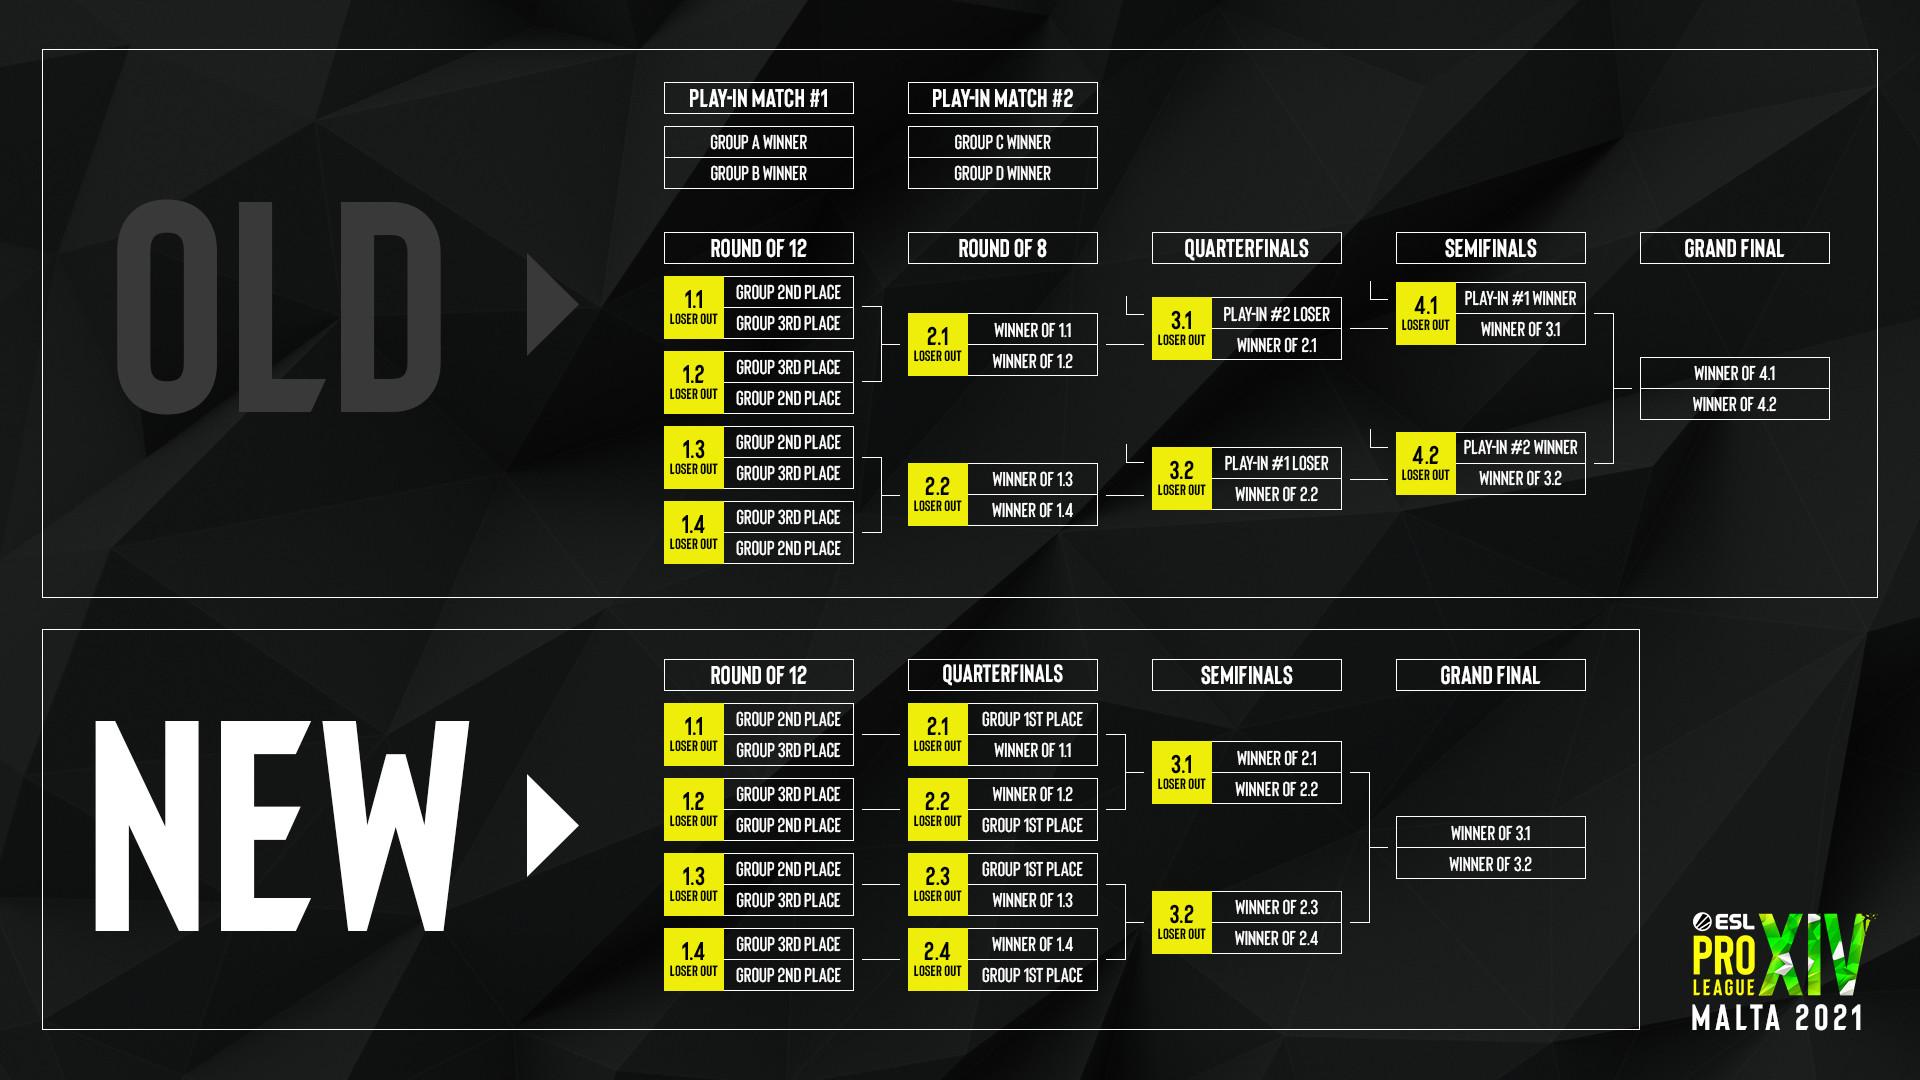 ESL ändert Playoff-Format der Pro League